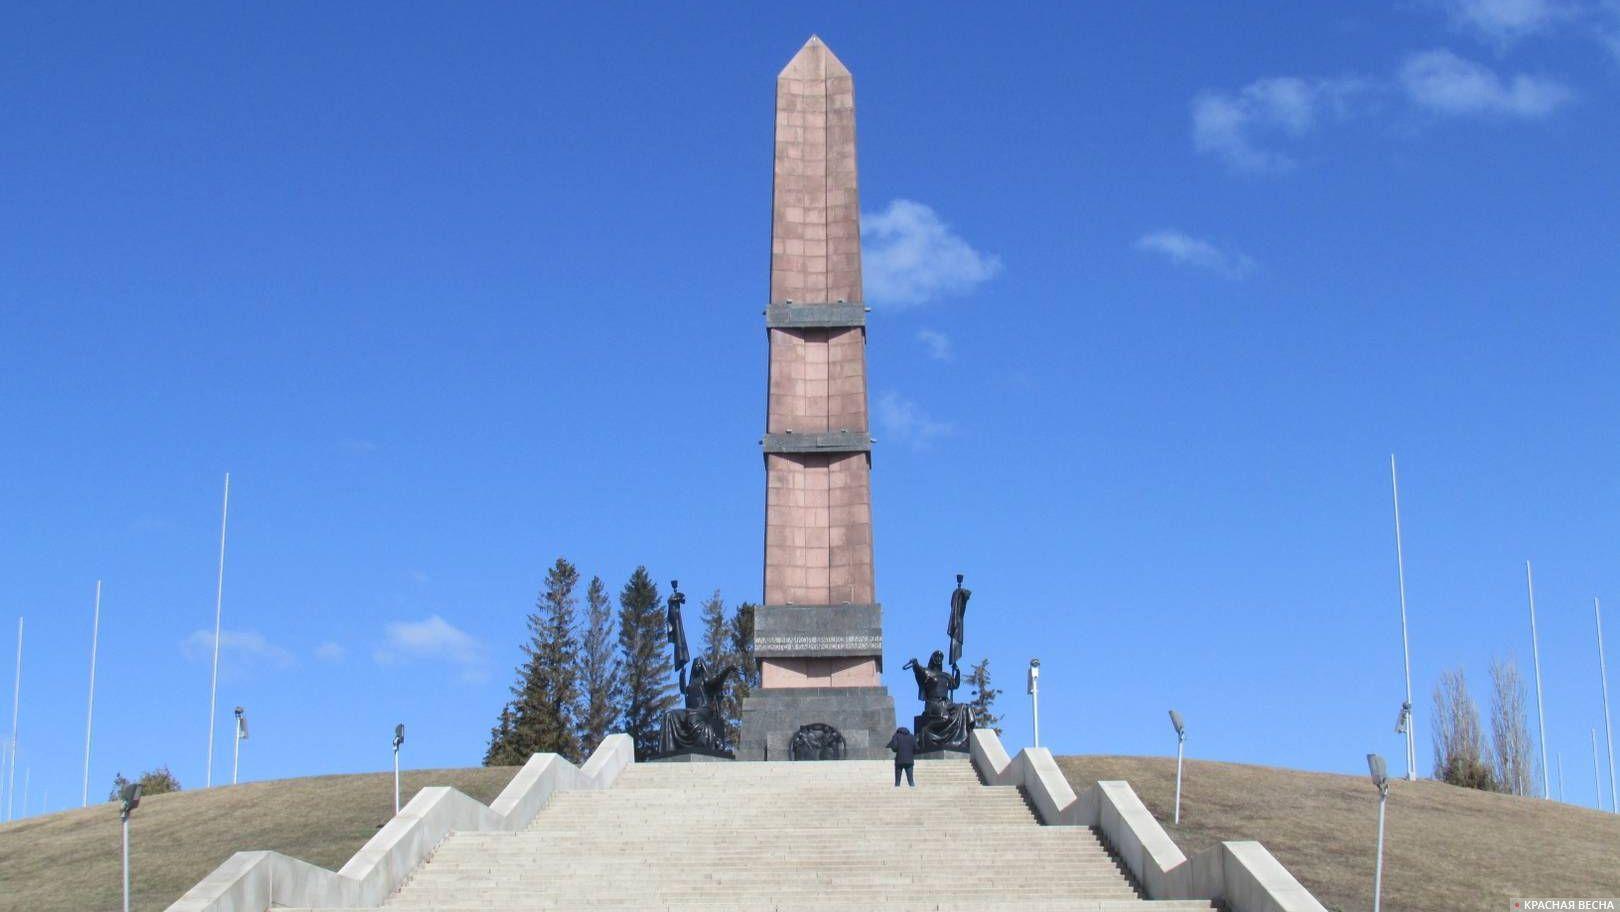 Монумент дружбы. Уфа. Республика Башкортостан